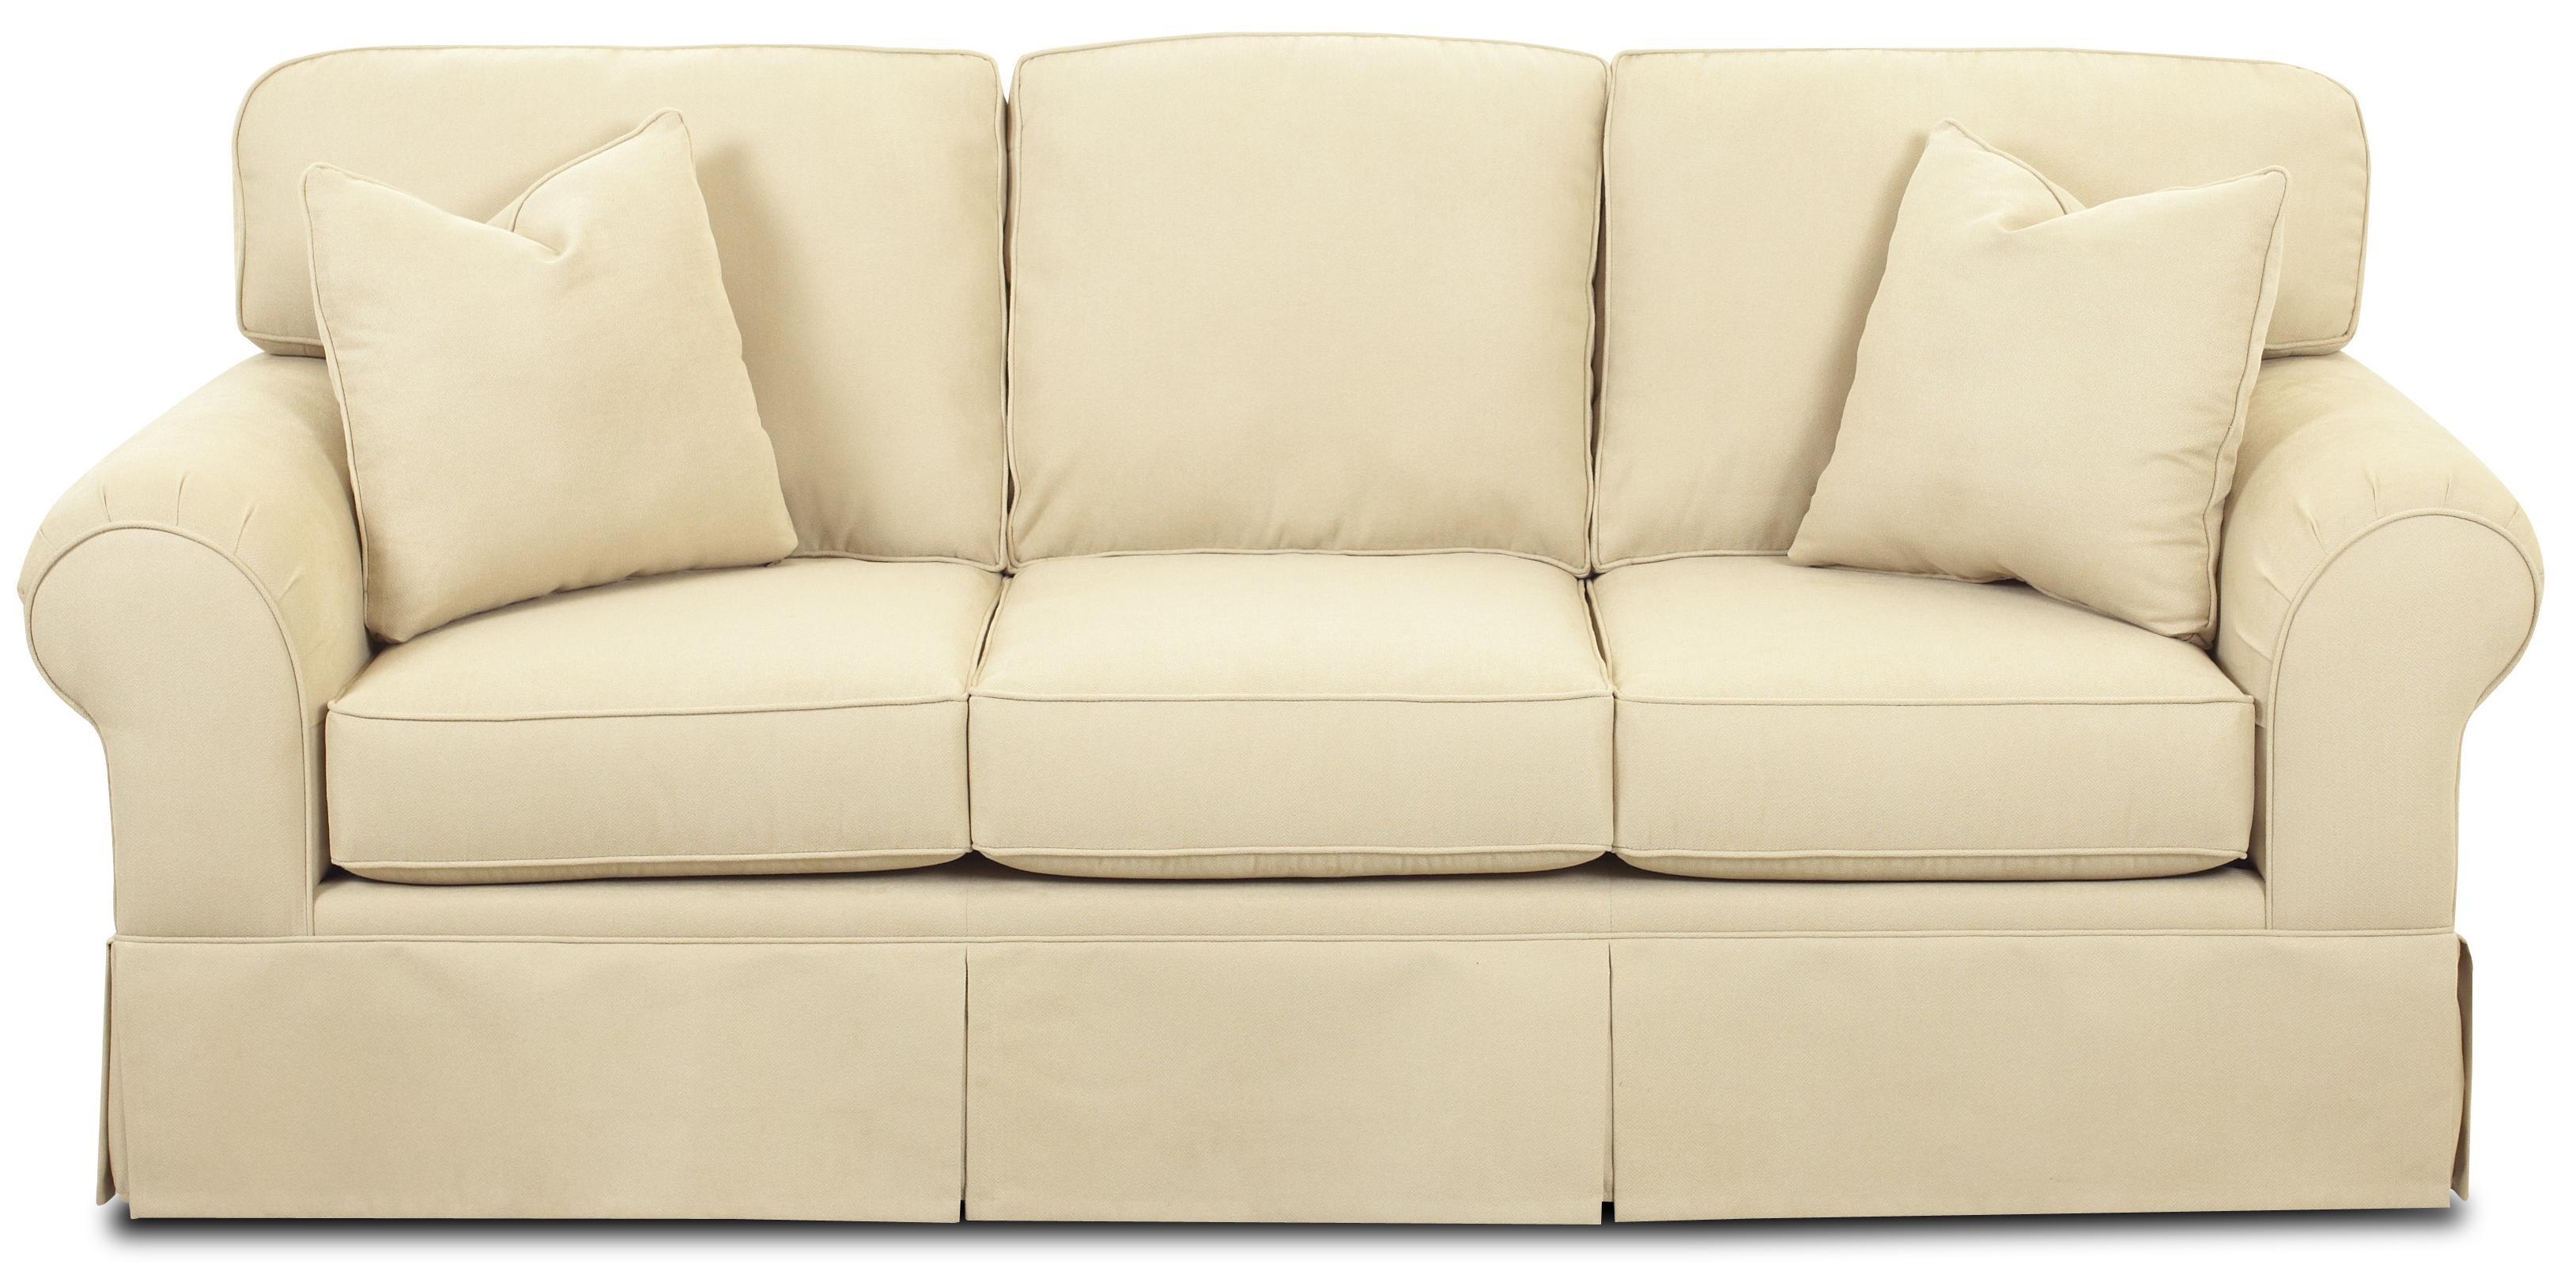 Klaussner Woodwin Sofa - Item Number: B48930S Graham Sand